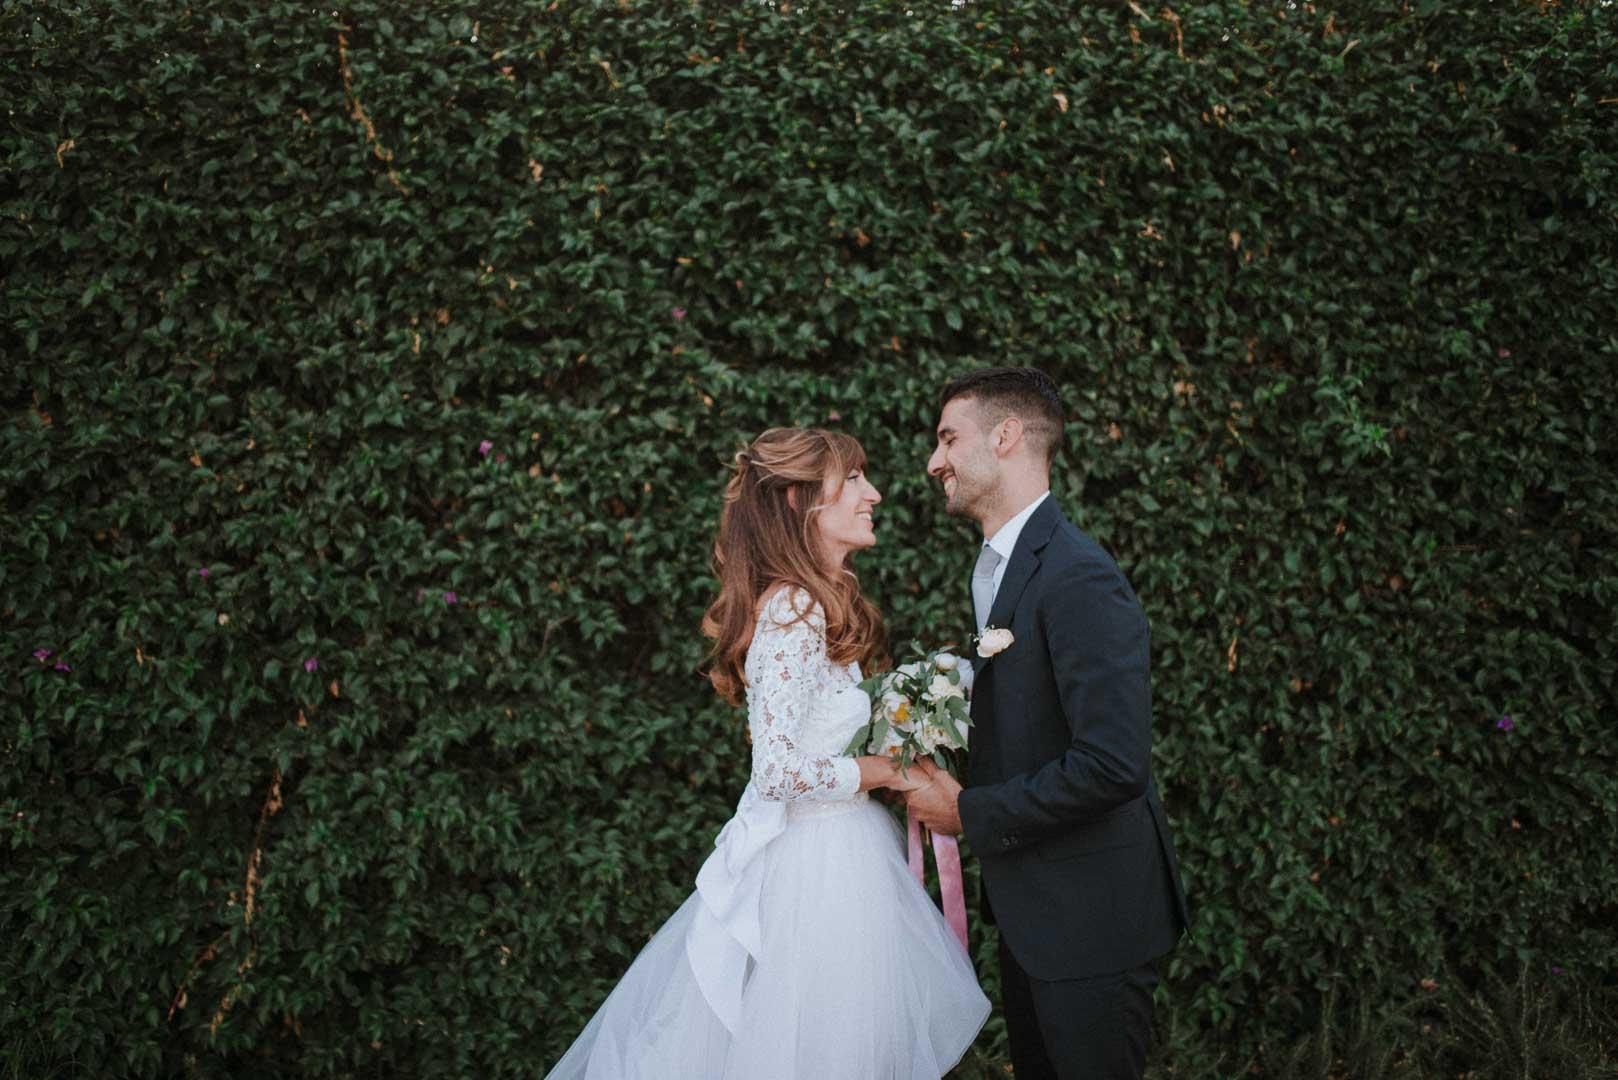 wedding-photographer-destination-fineart-bespoke-reportage-napoli-nabilah-vivianeizzo-spazio46-101